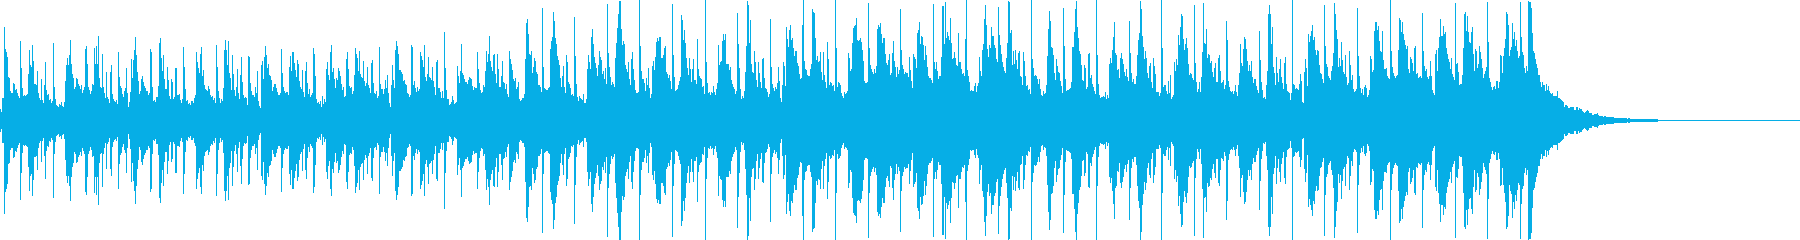 Pf「心象」生楽器音源打込Inst和風現の再生済みの波形